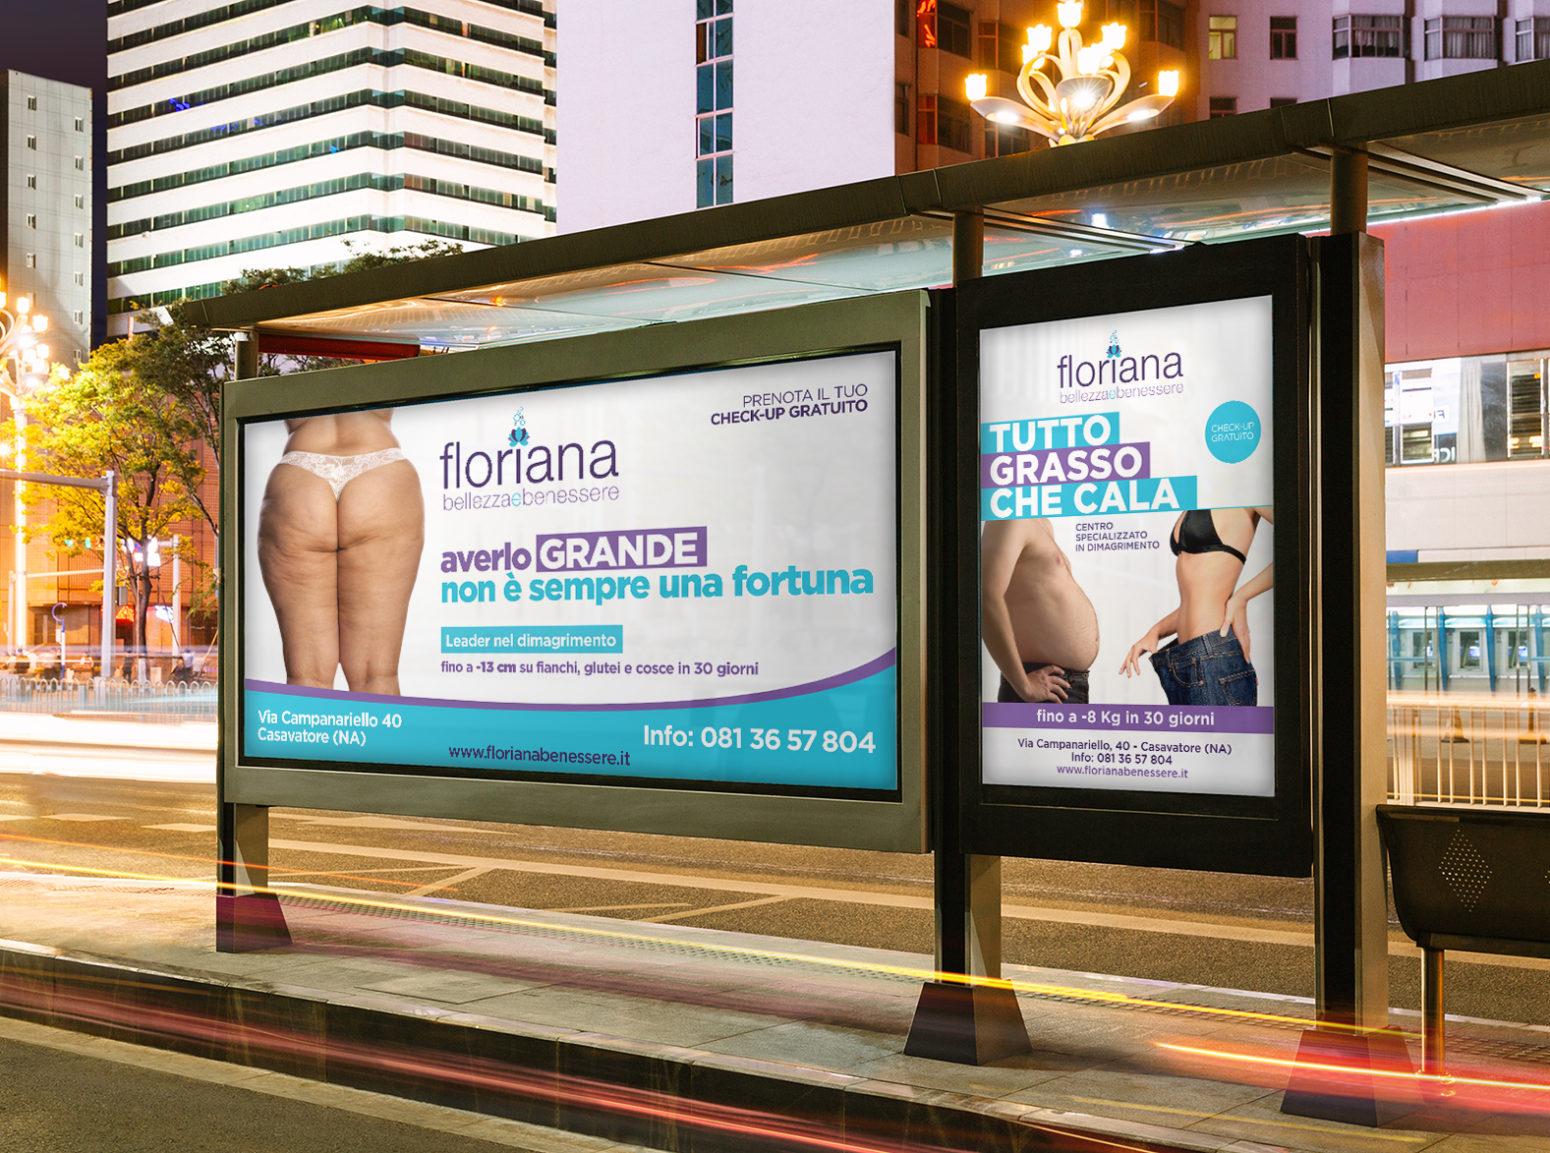 Floriana advertising